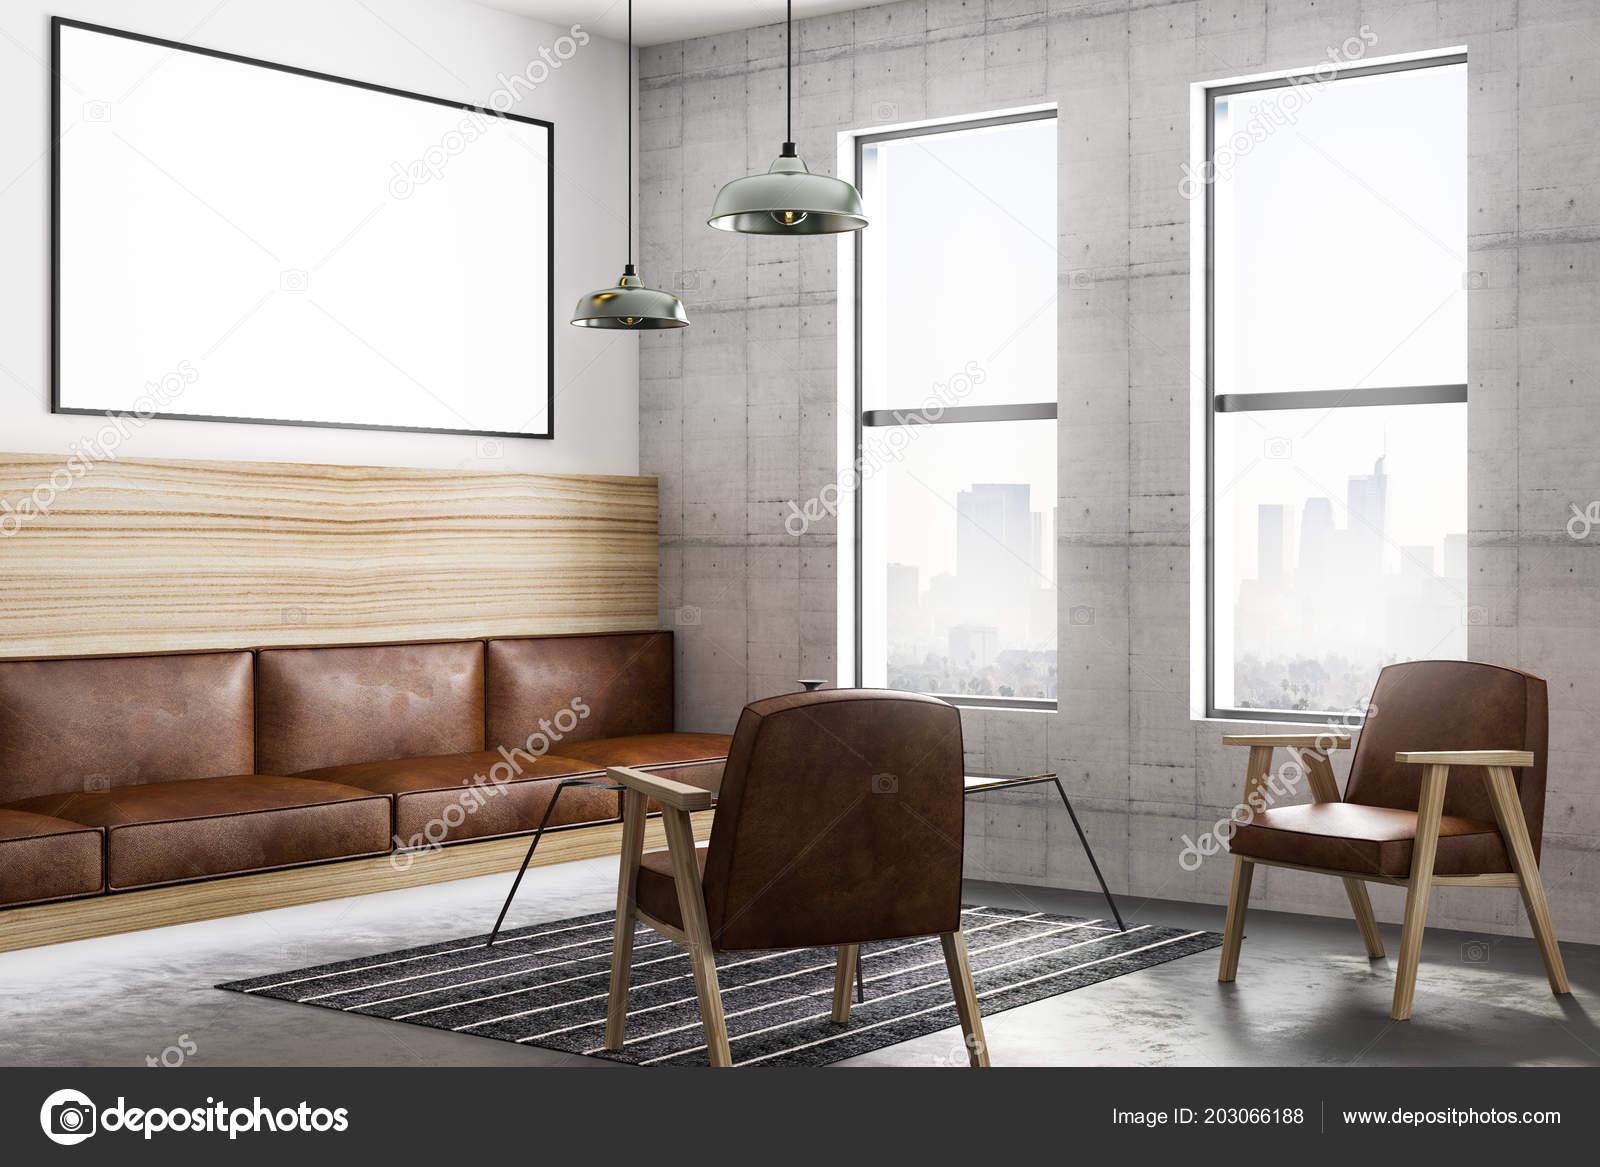 Donkere Vintage Woonkamer : Lege poster donkere muur moderne loft stijl woonkamer met uitzicht